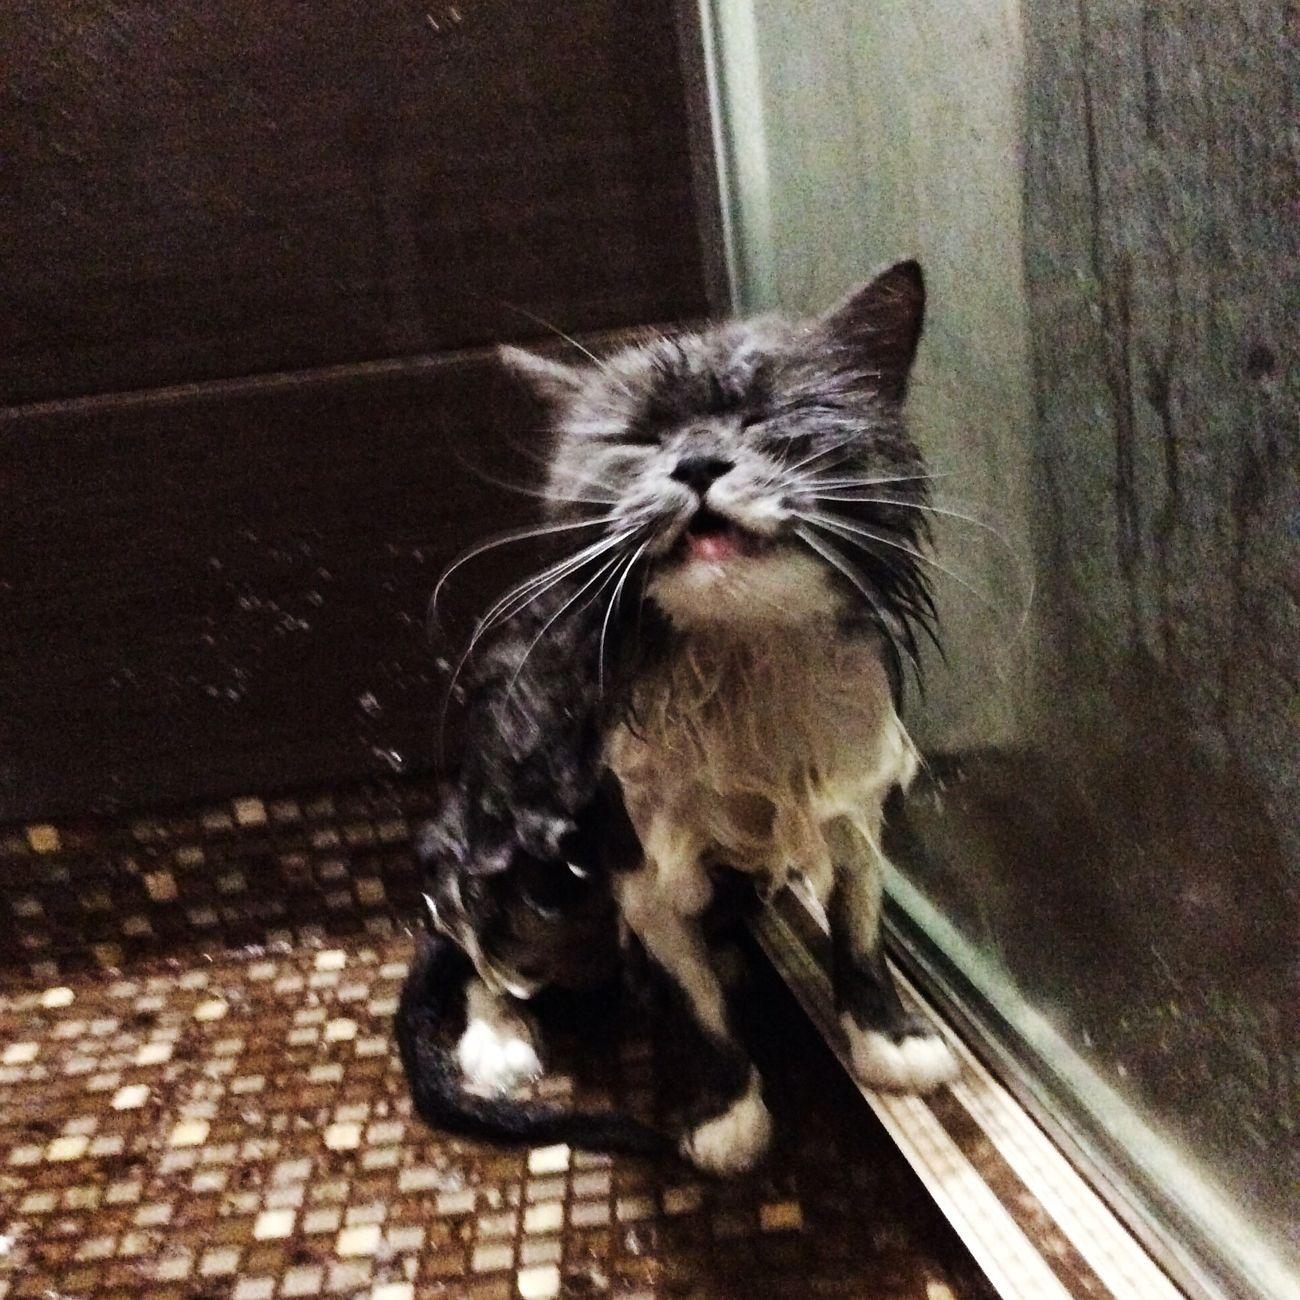 One Animal Cat Pets Animal Themes